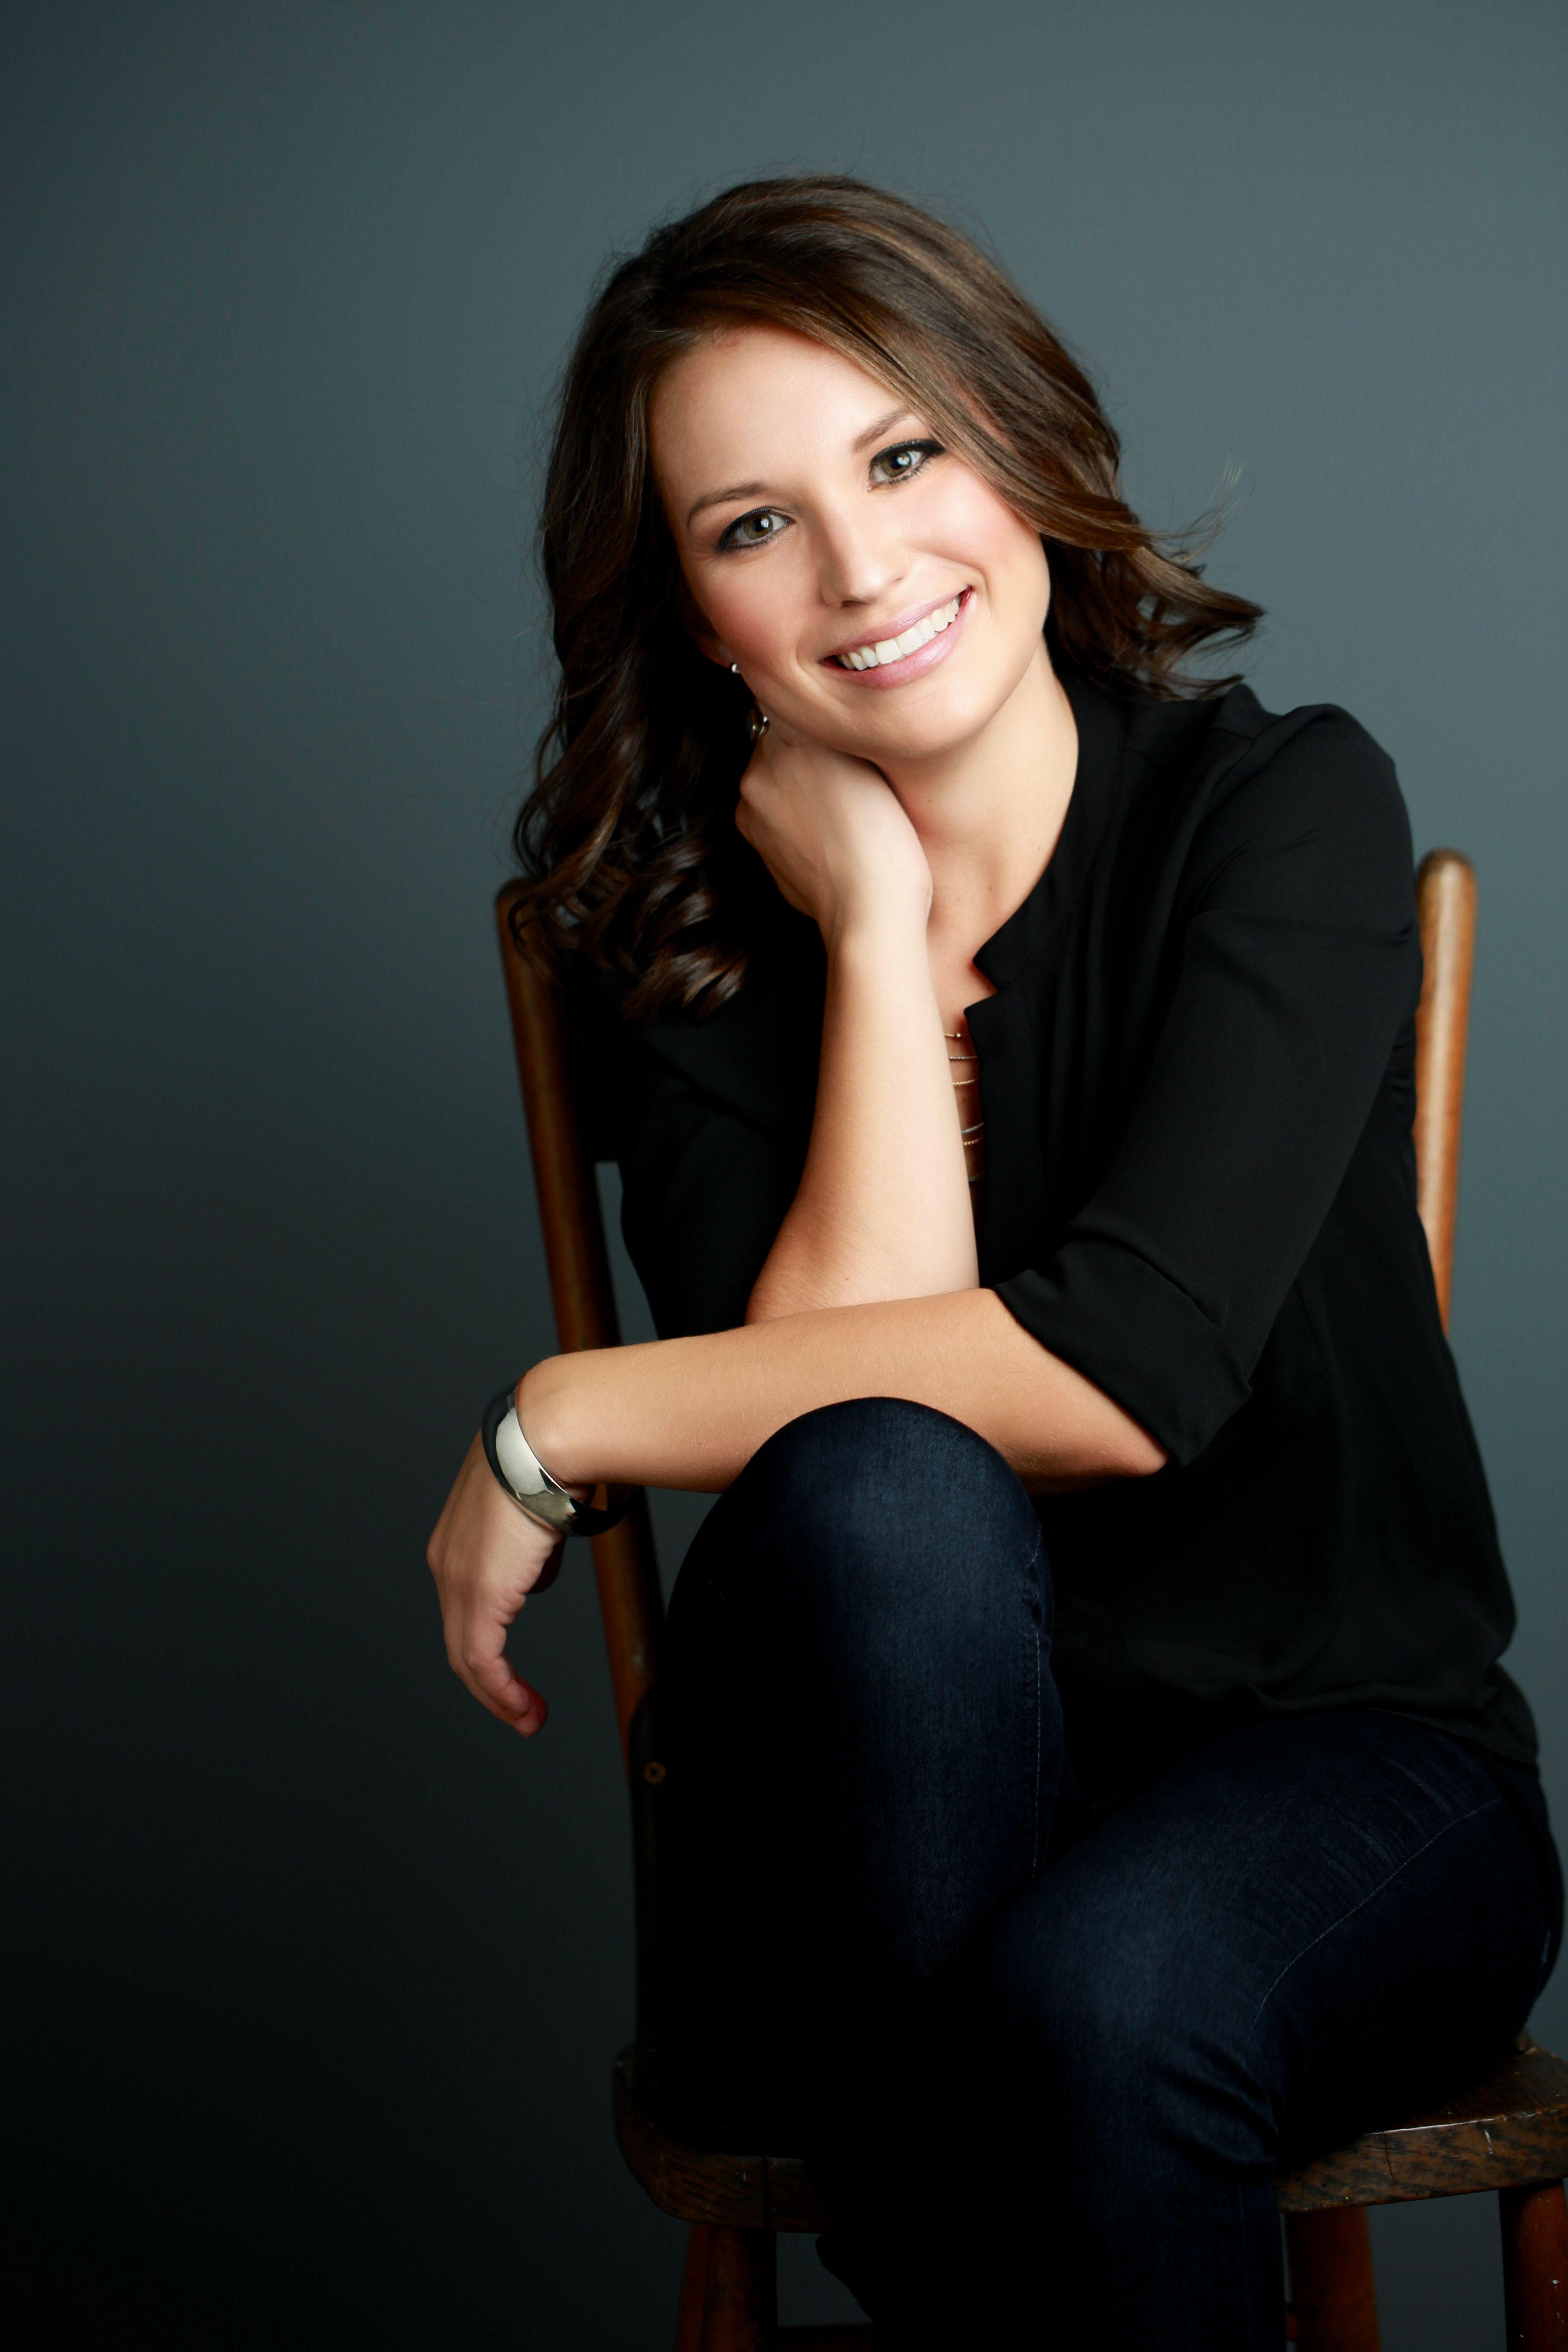 Female photoshoot - businesswoman, Mandy McEwen ...